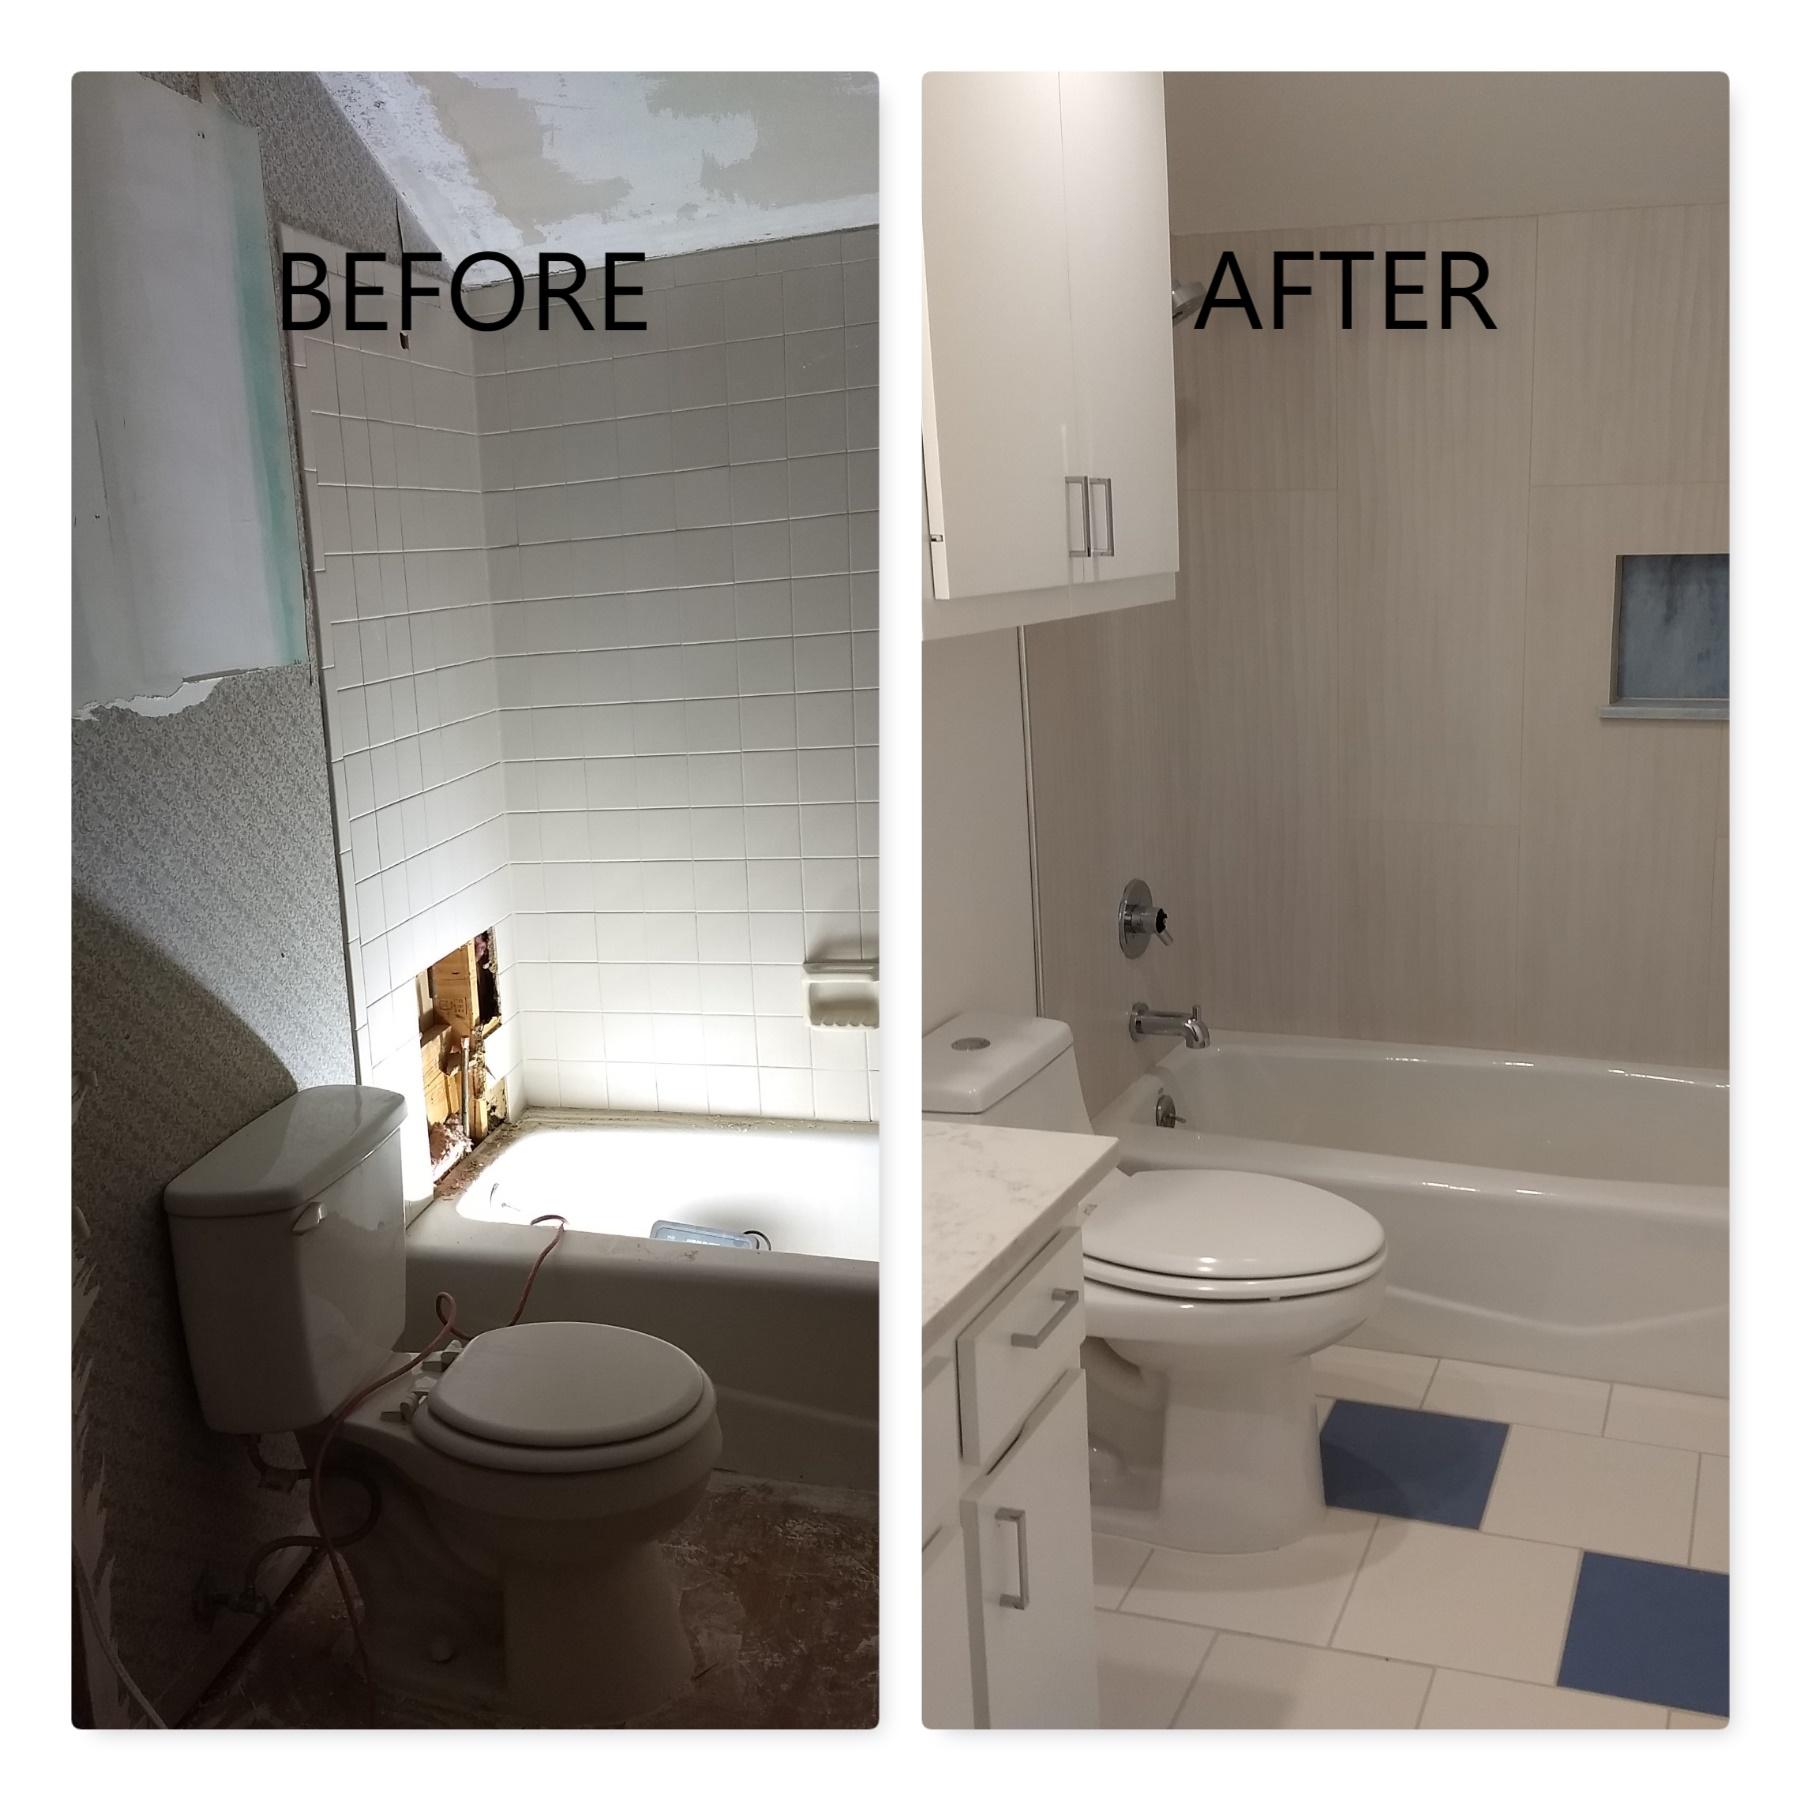 00 Upper Bathroom